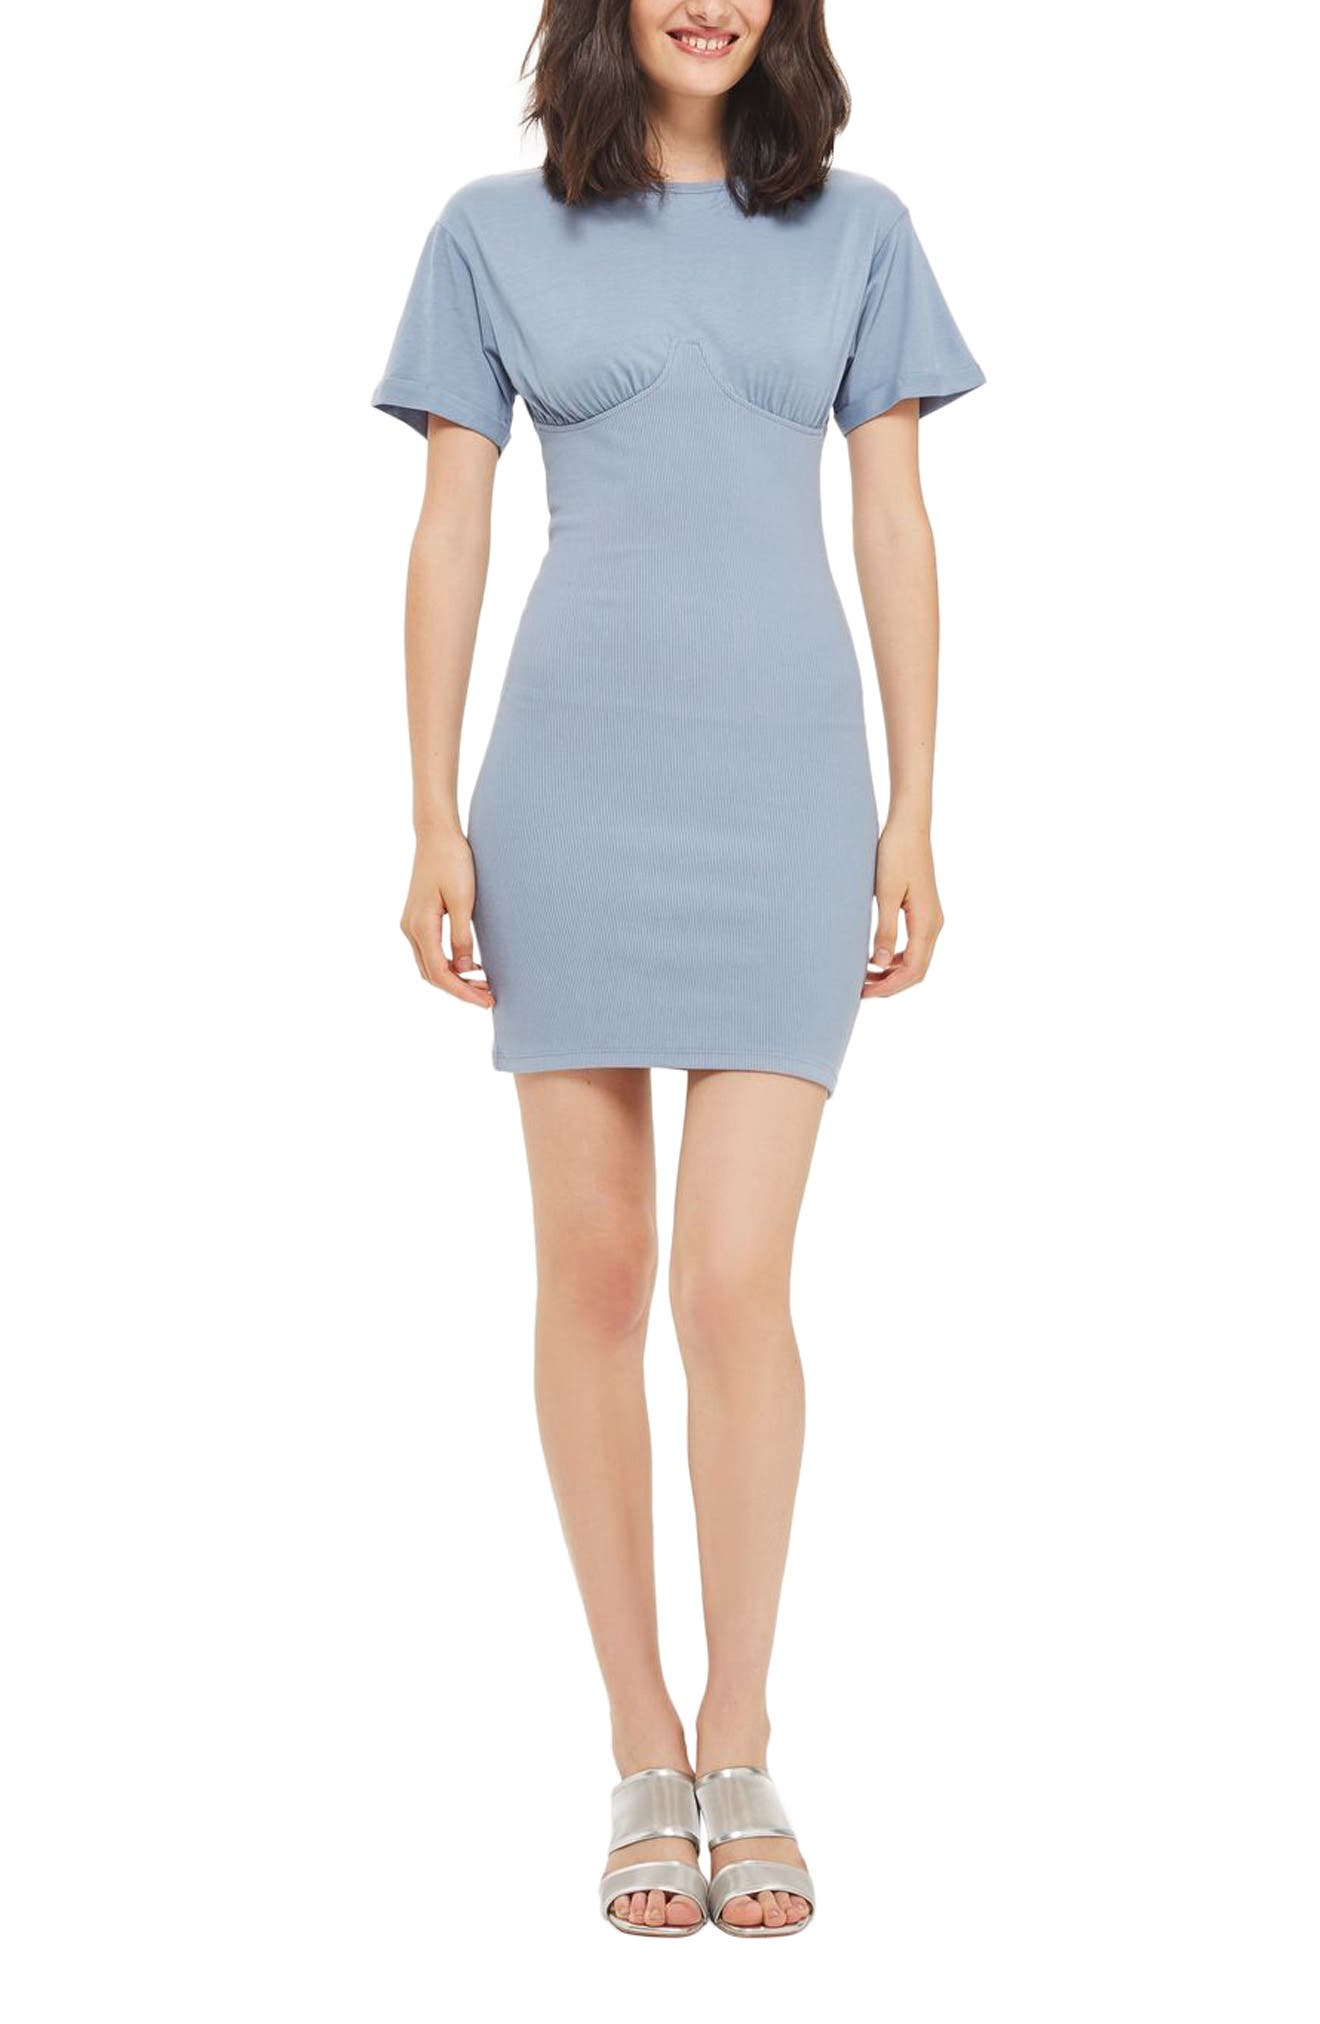 Topshop Bustcup Ribbed T-Shirt Dress